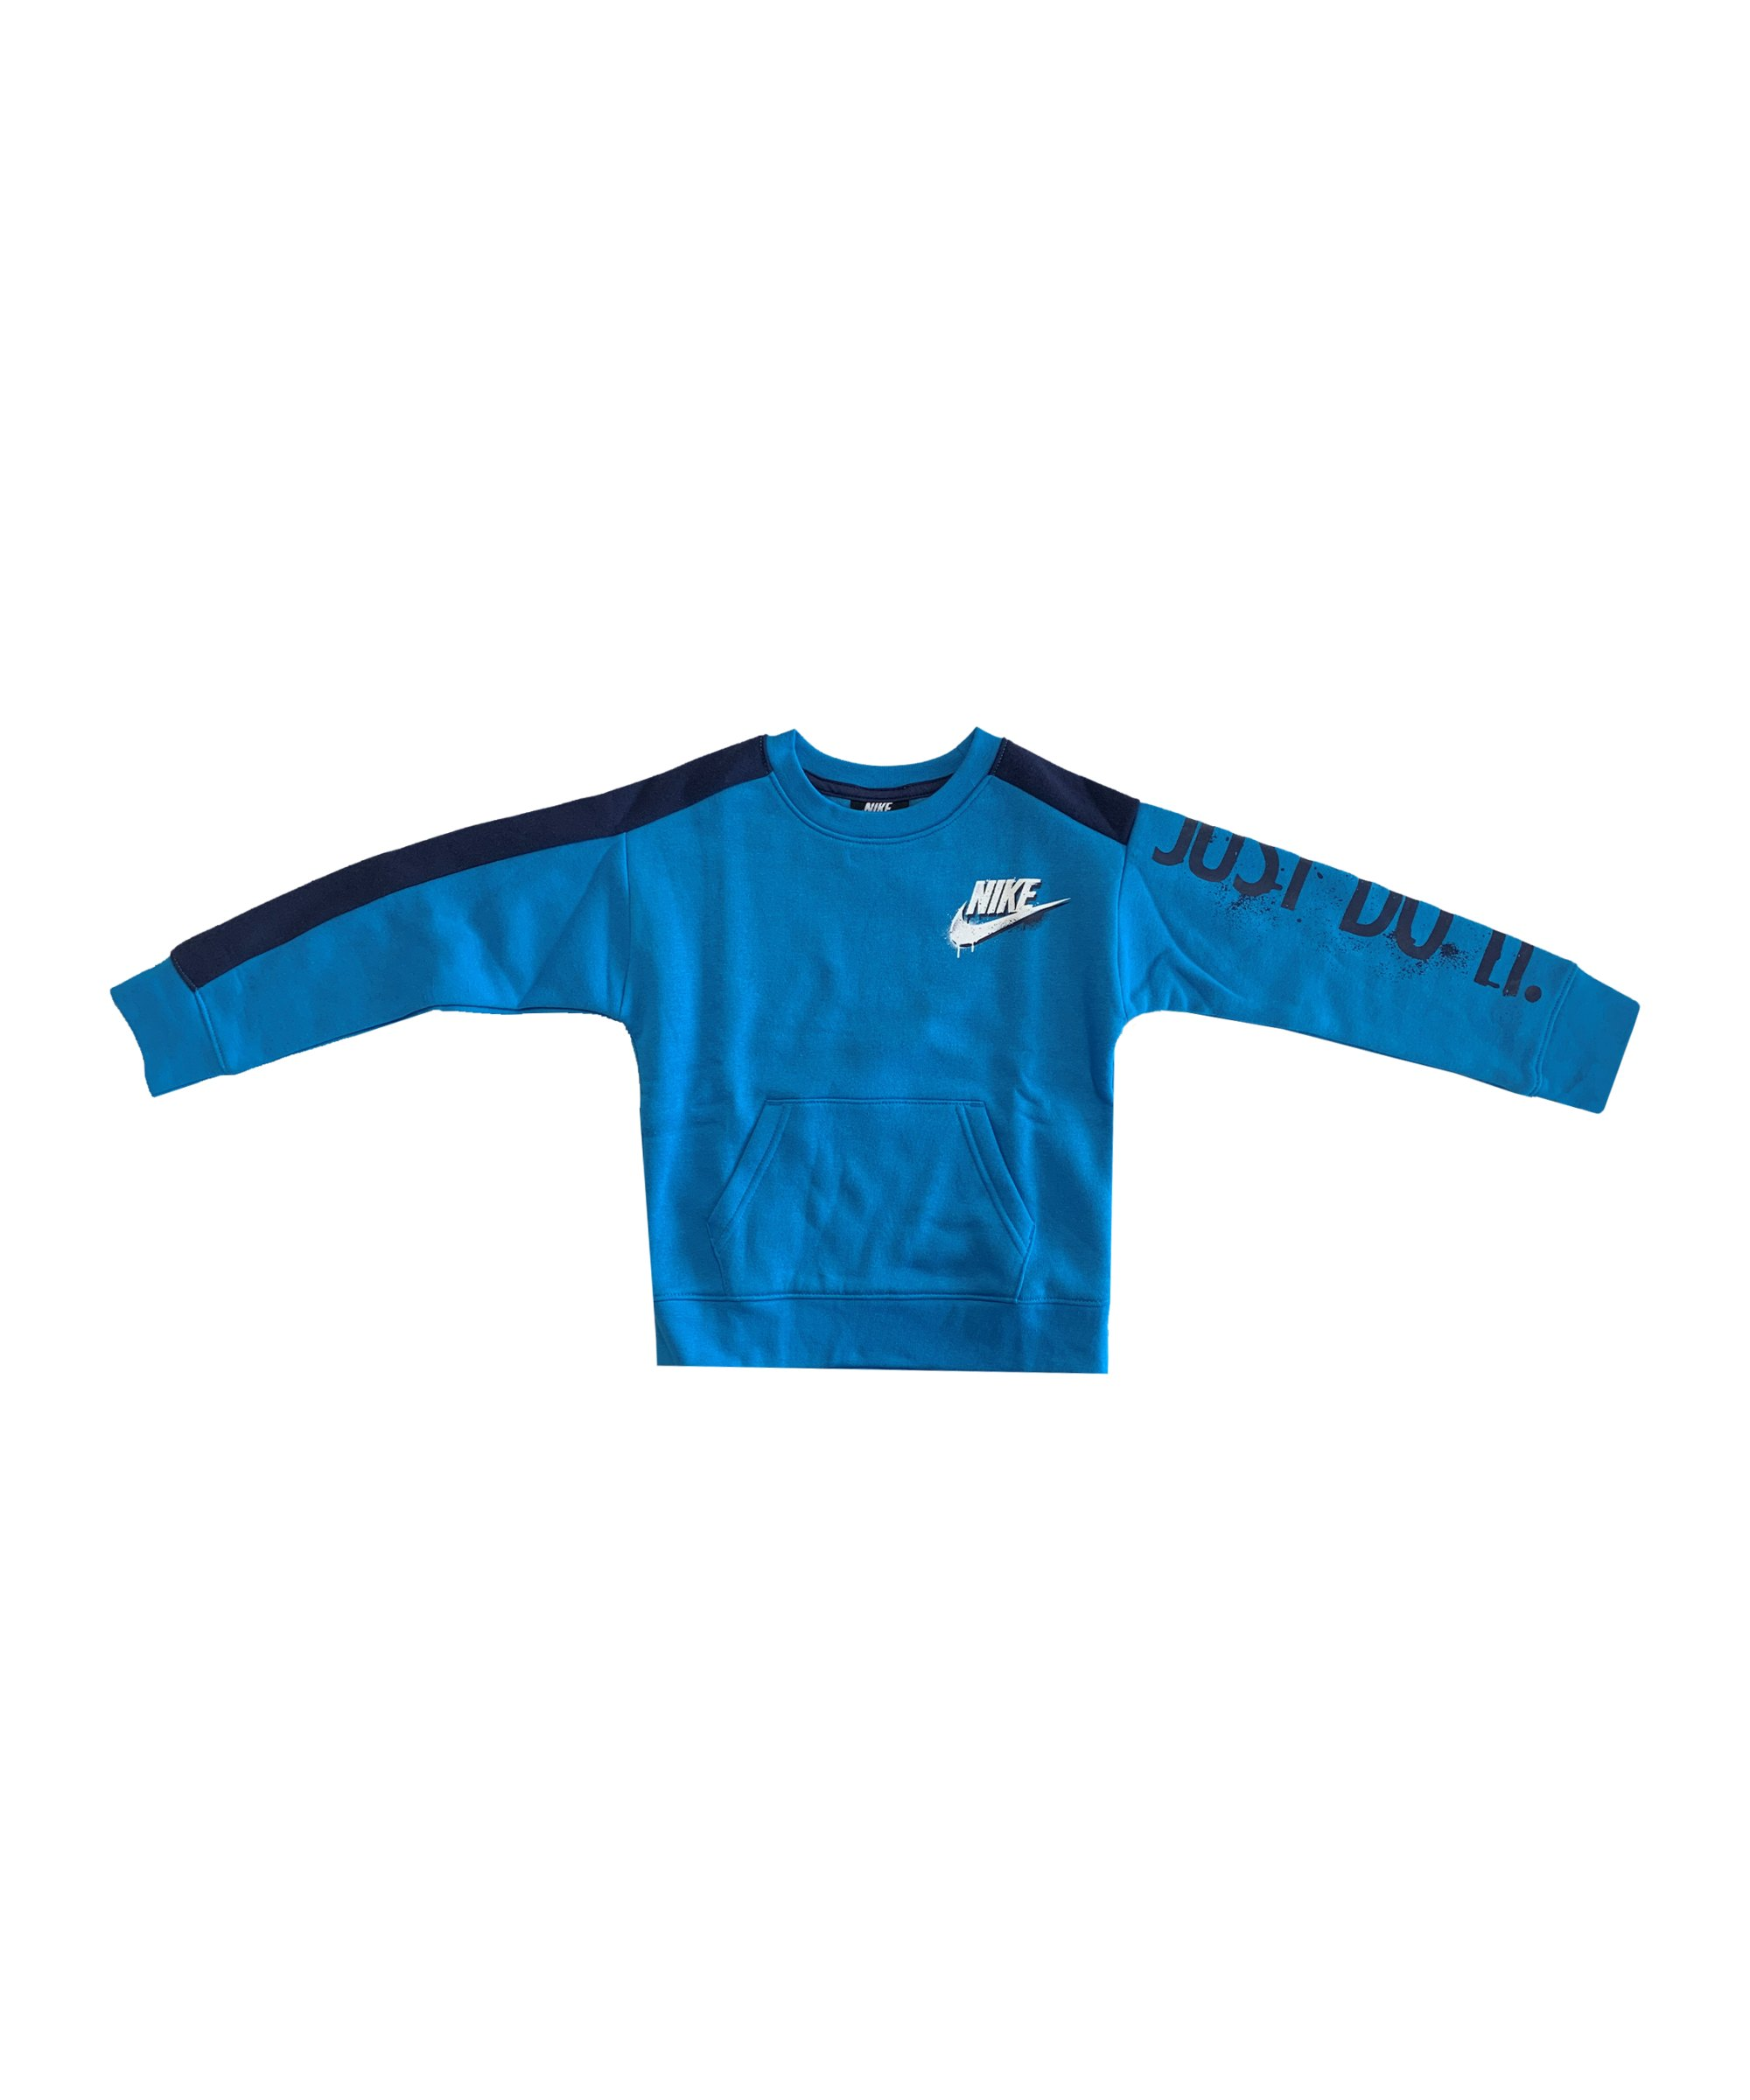 Nike Tag Crew Sweatshirt Kids Blau FU3H - blau